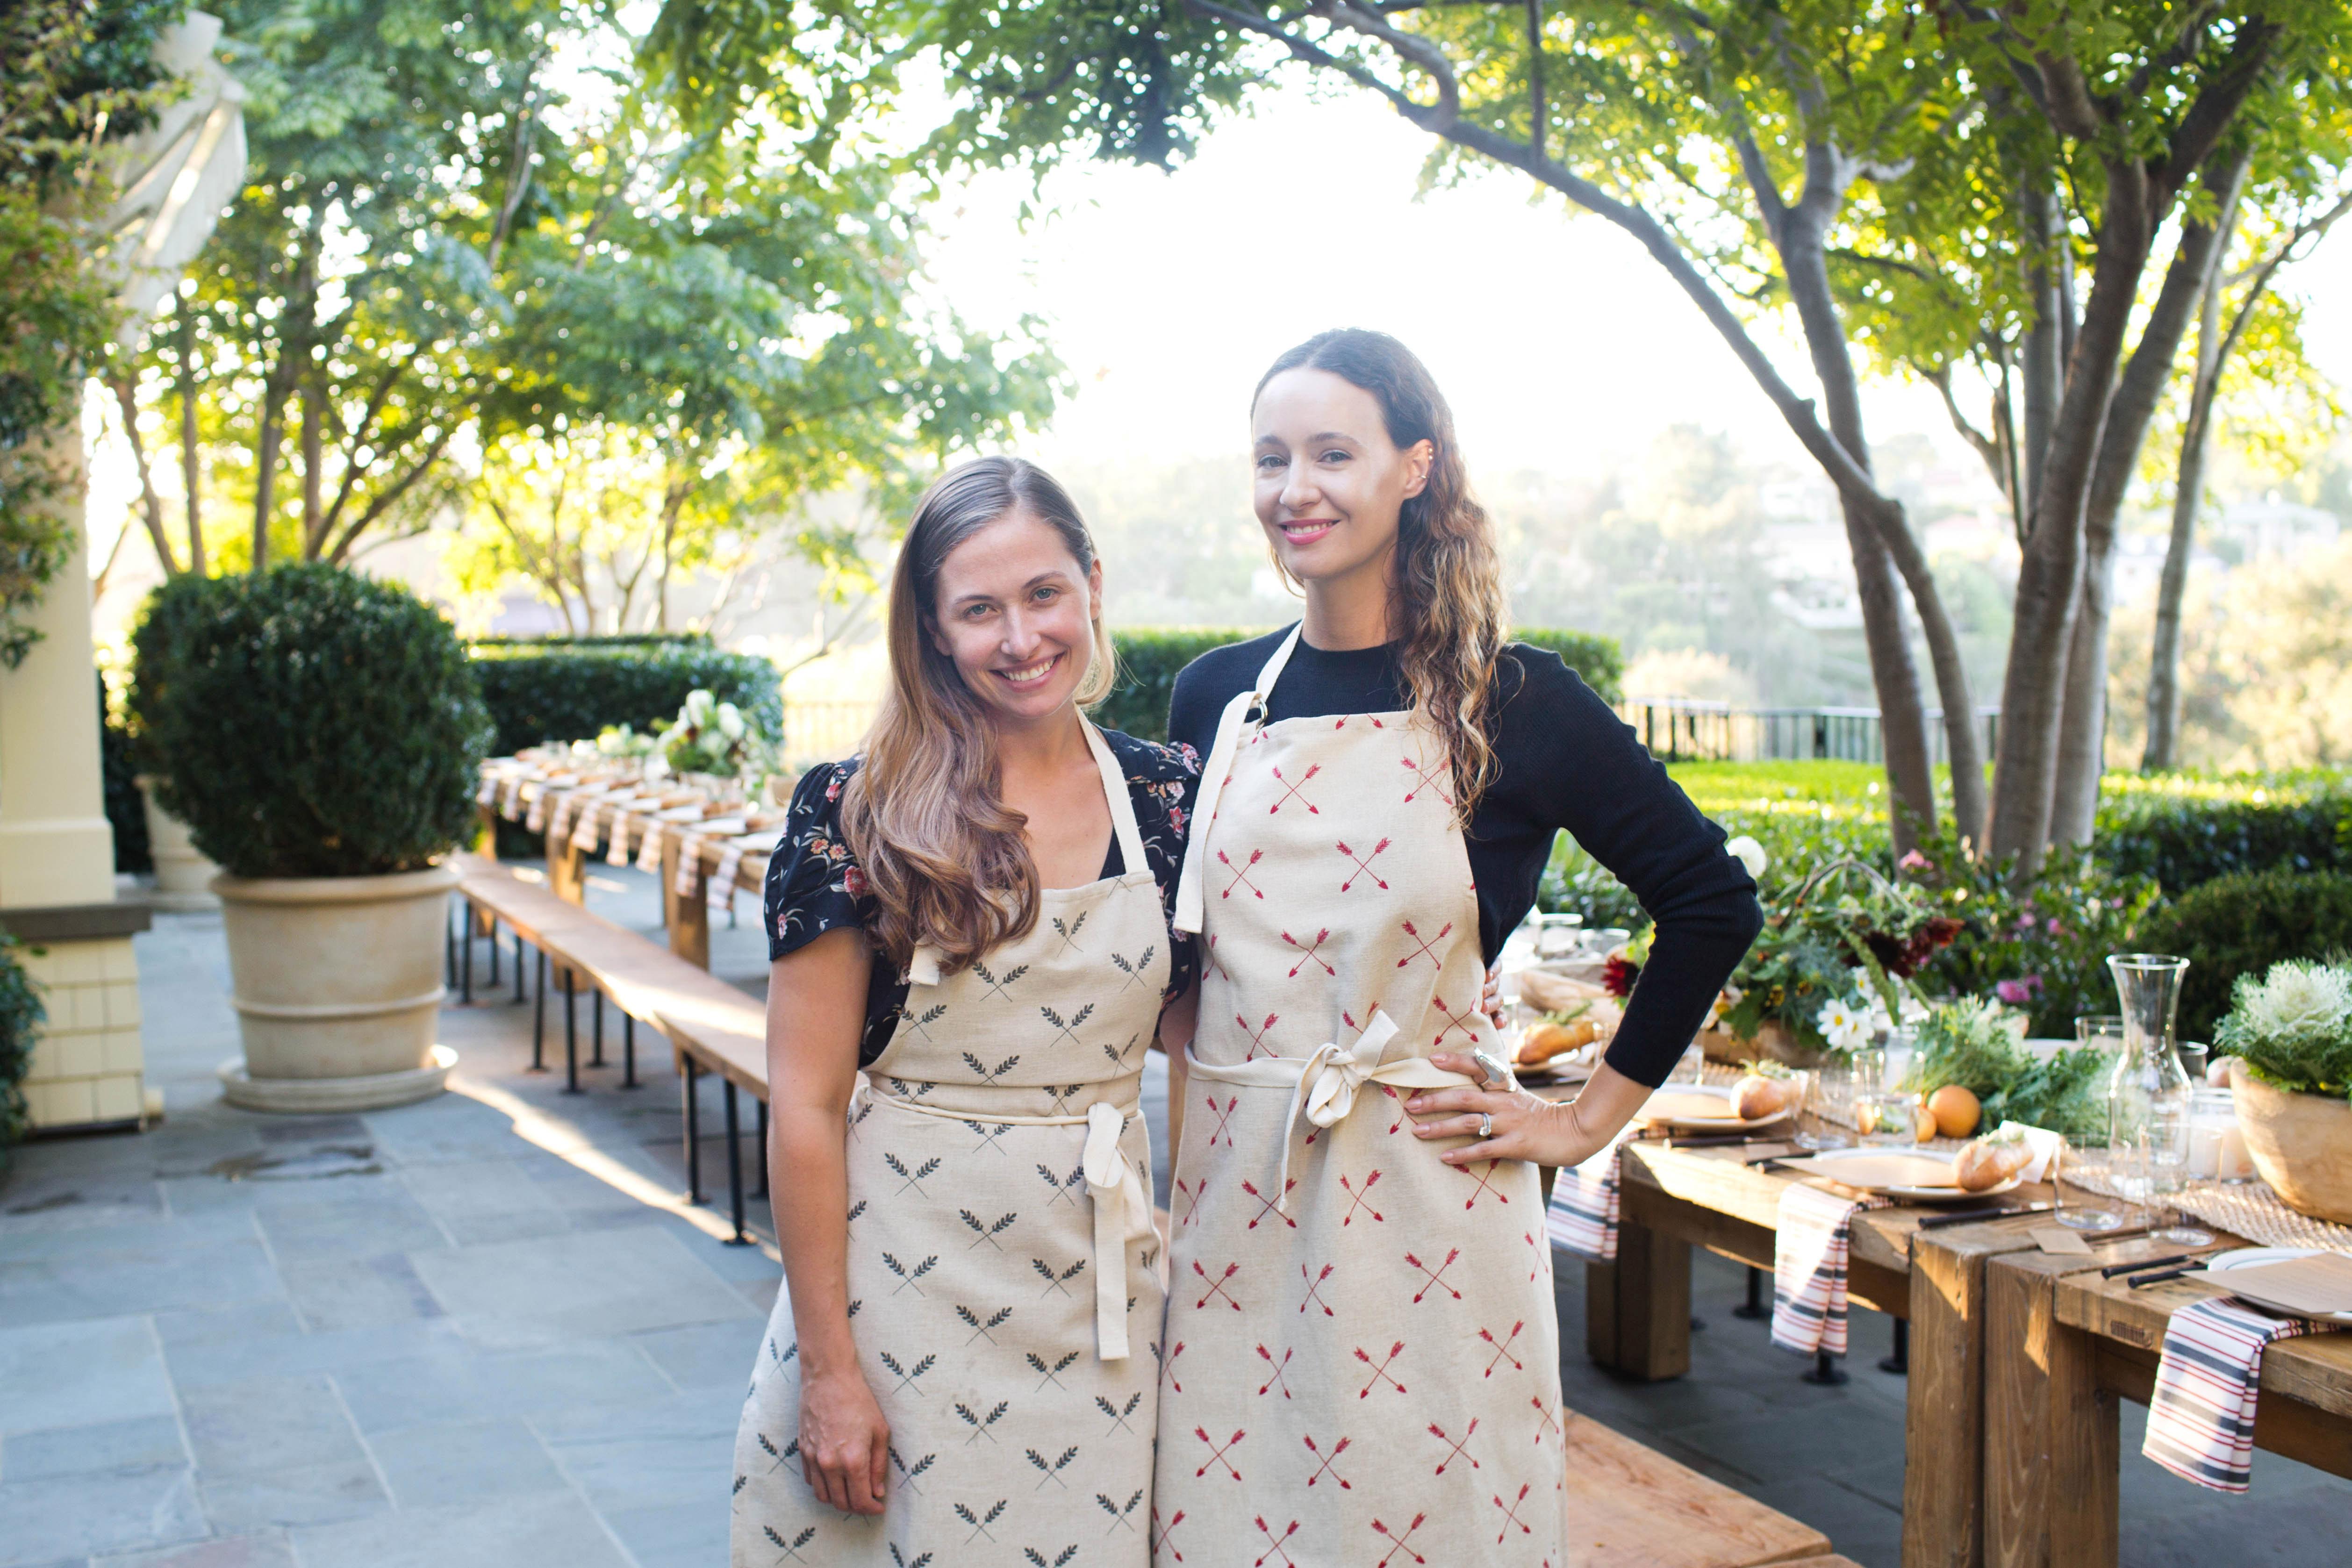 Autumn Entertaining: A FEED Supper with Lauren Bush Lauren - The Menu 3